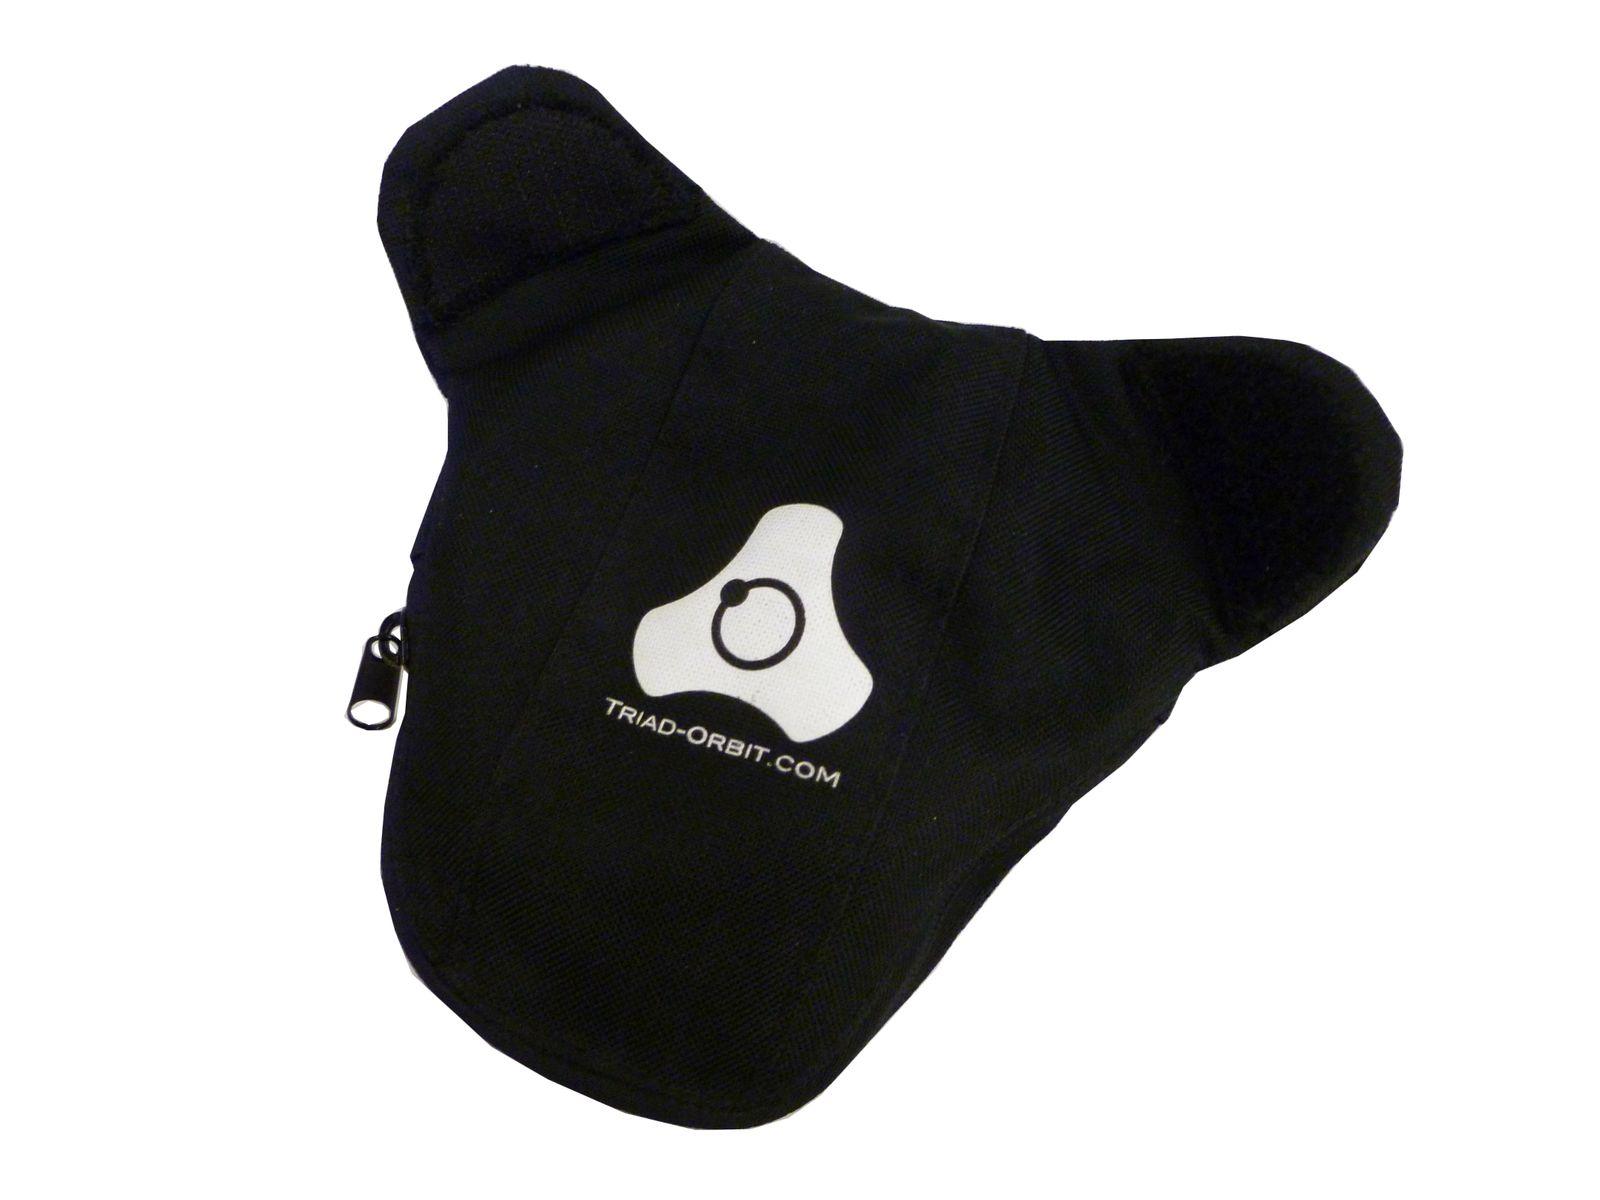 Triad-Orbit GB-3 Grav Ballast Bag